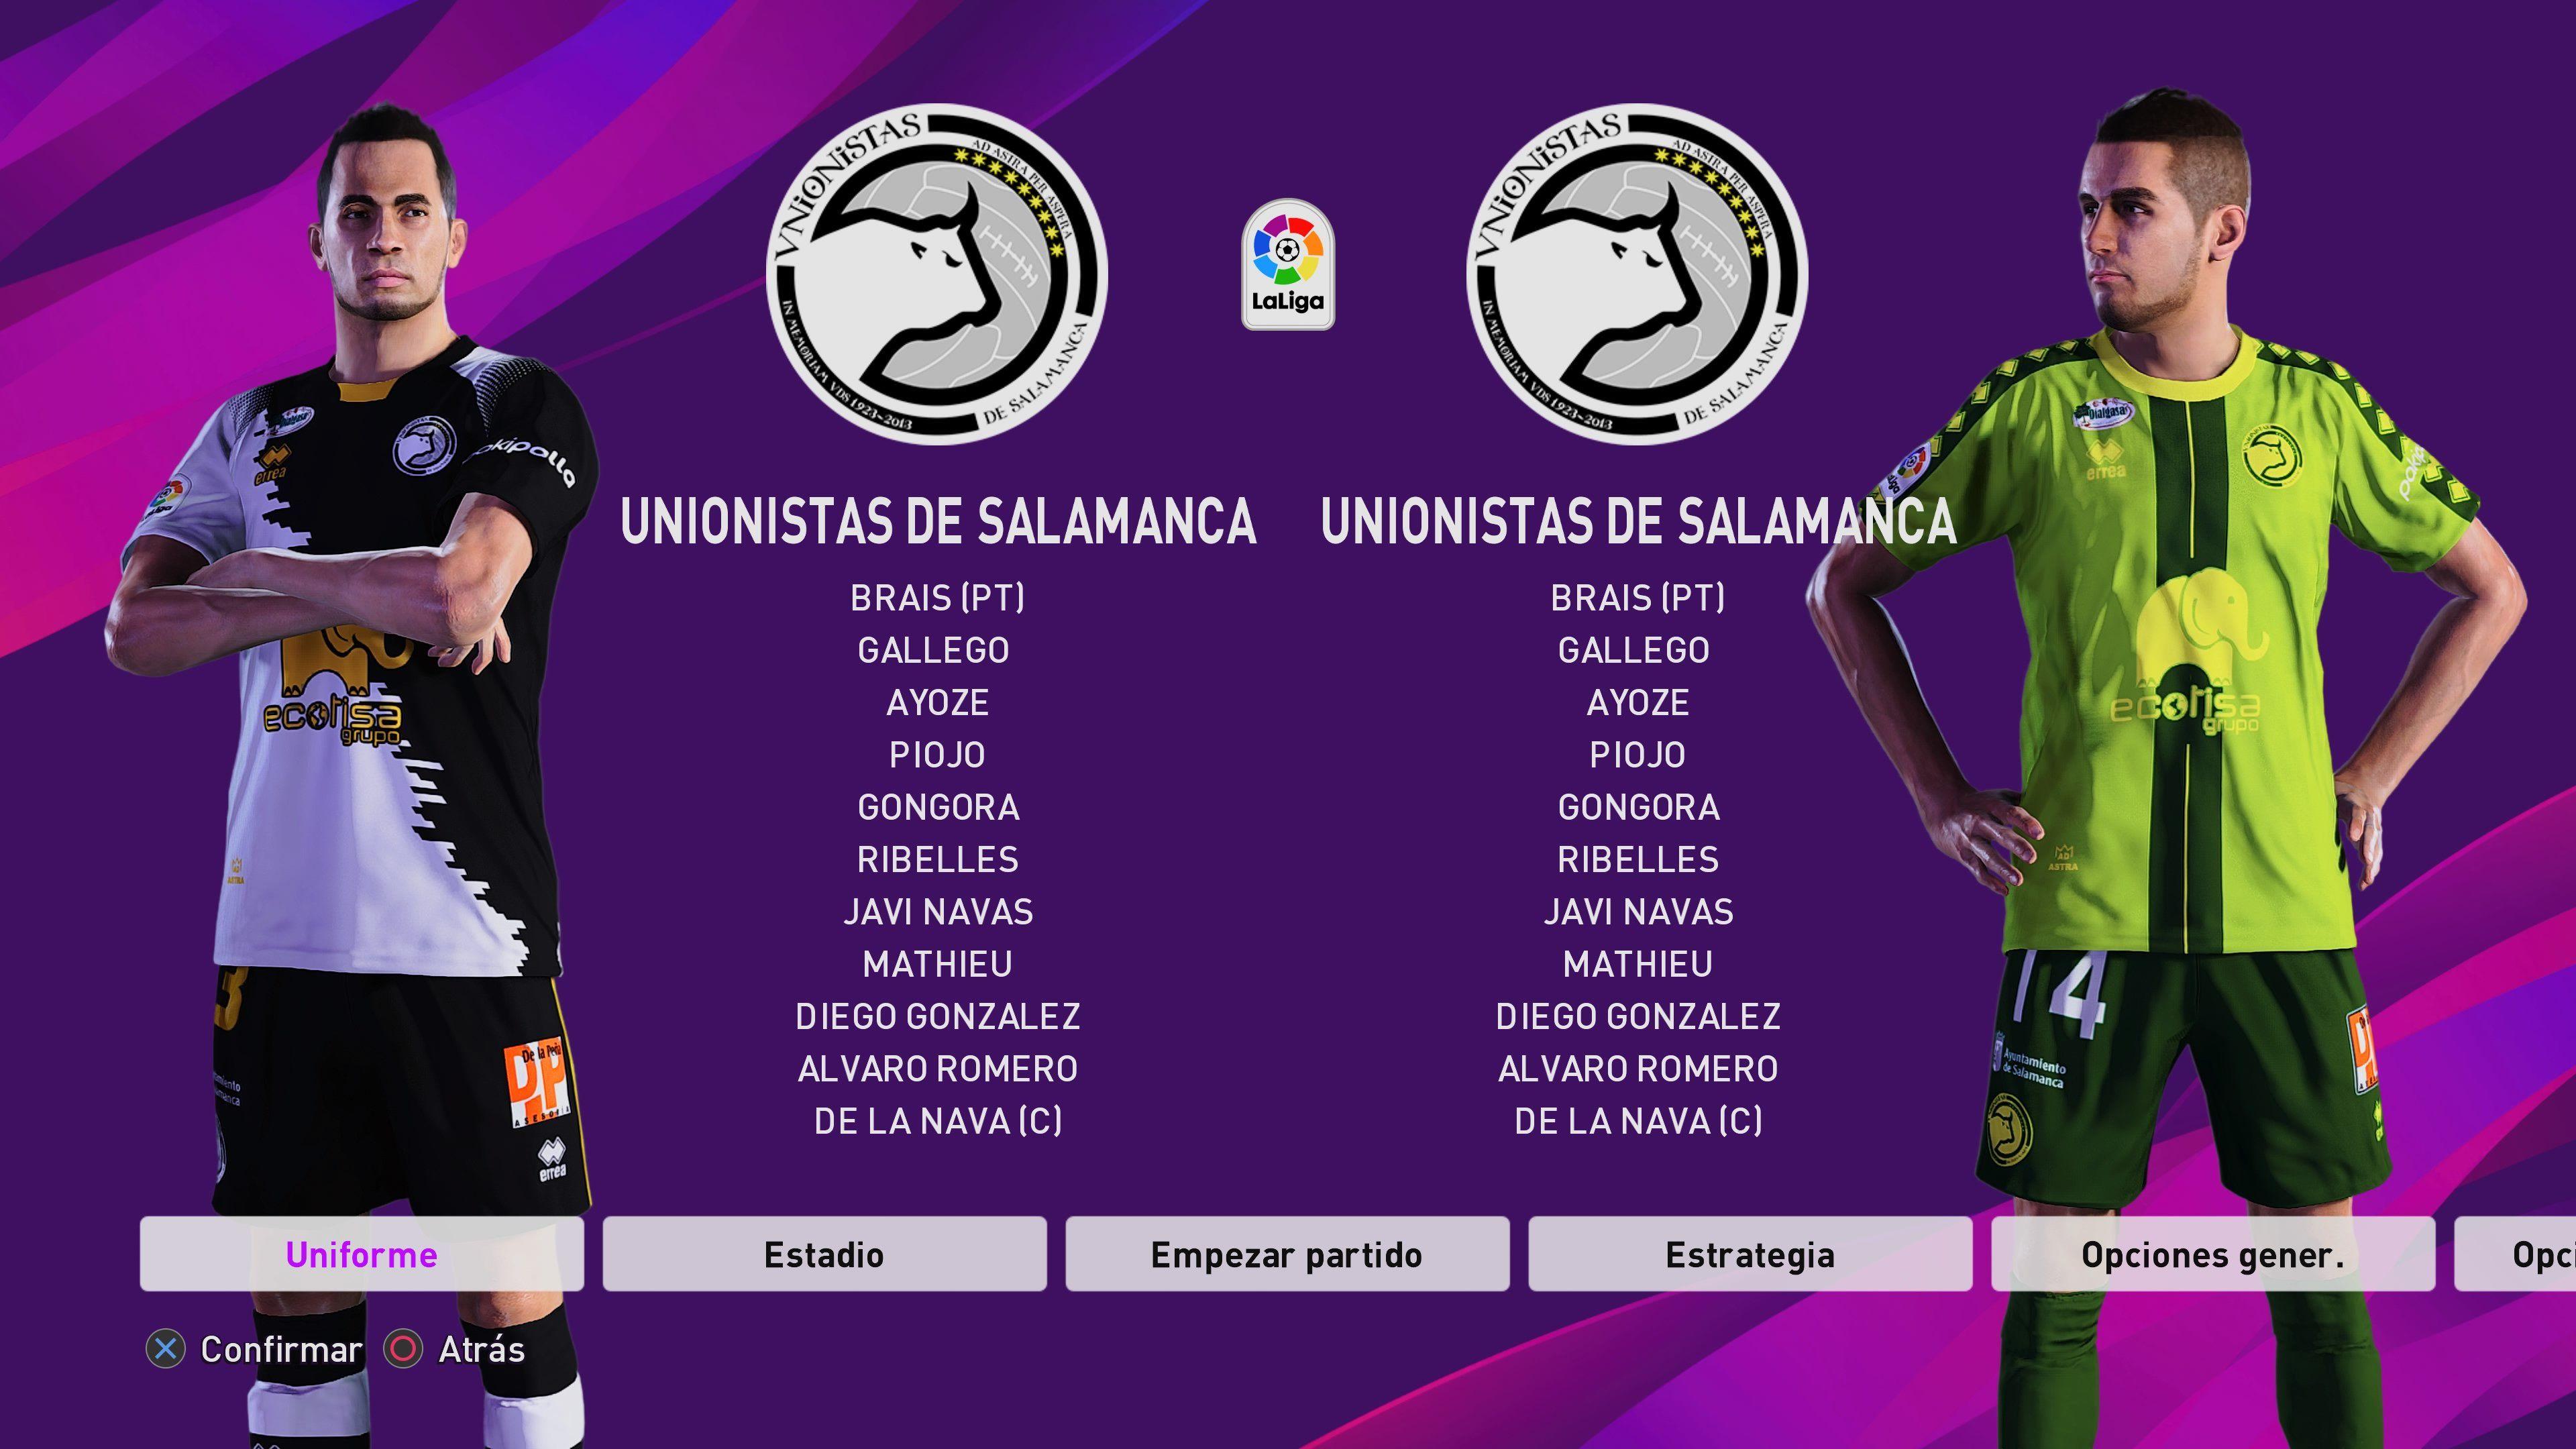 Unionistas de Salamanca CF by Funky_JR